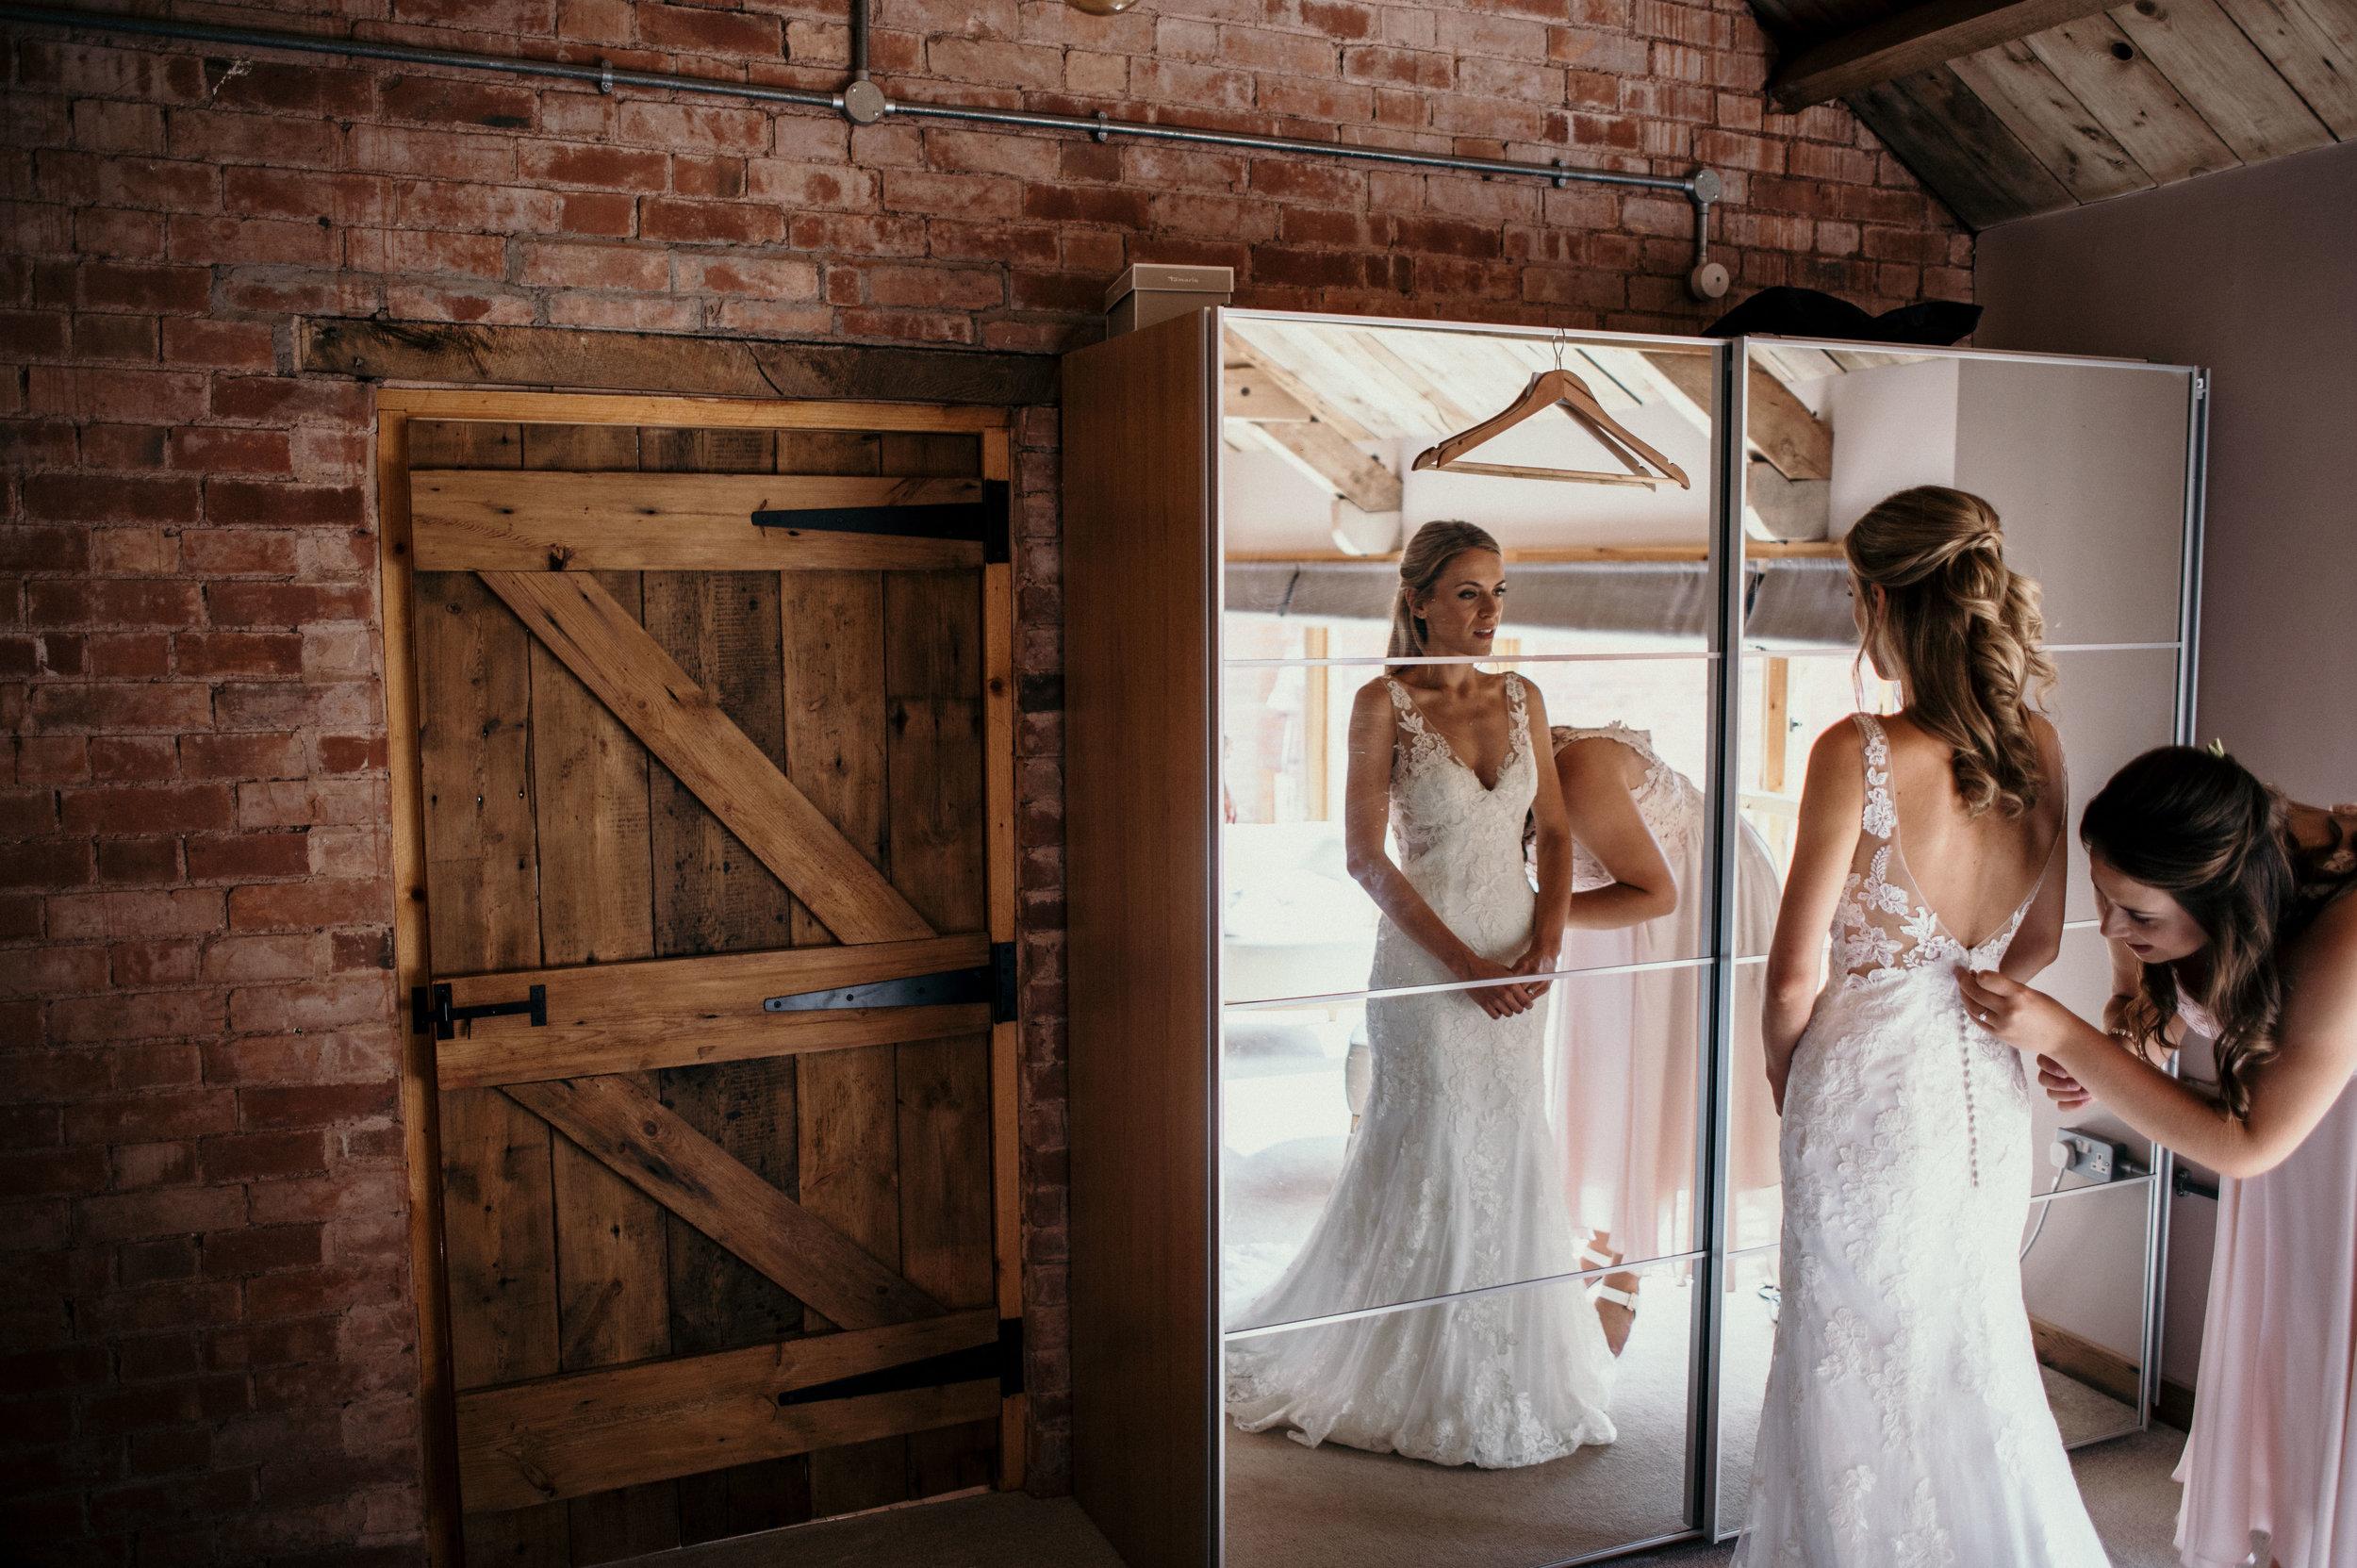 the-great-barn-wedding-photographer-devon-11.jpg